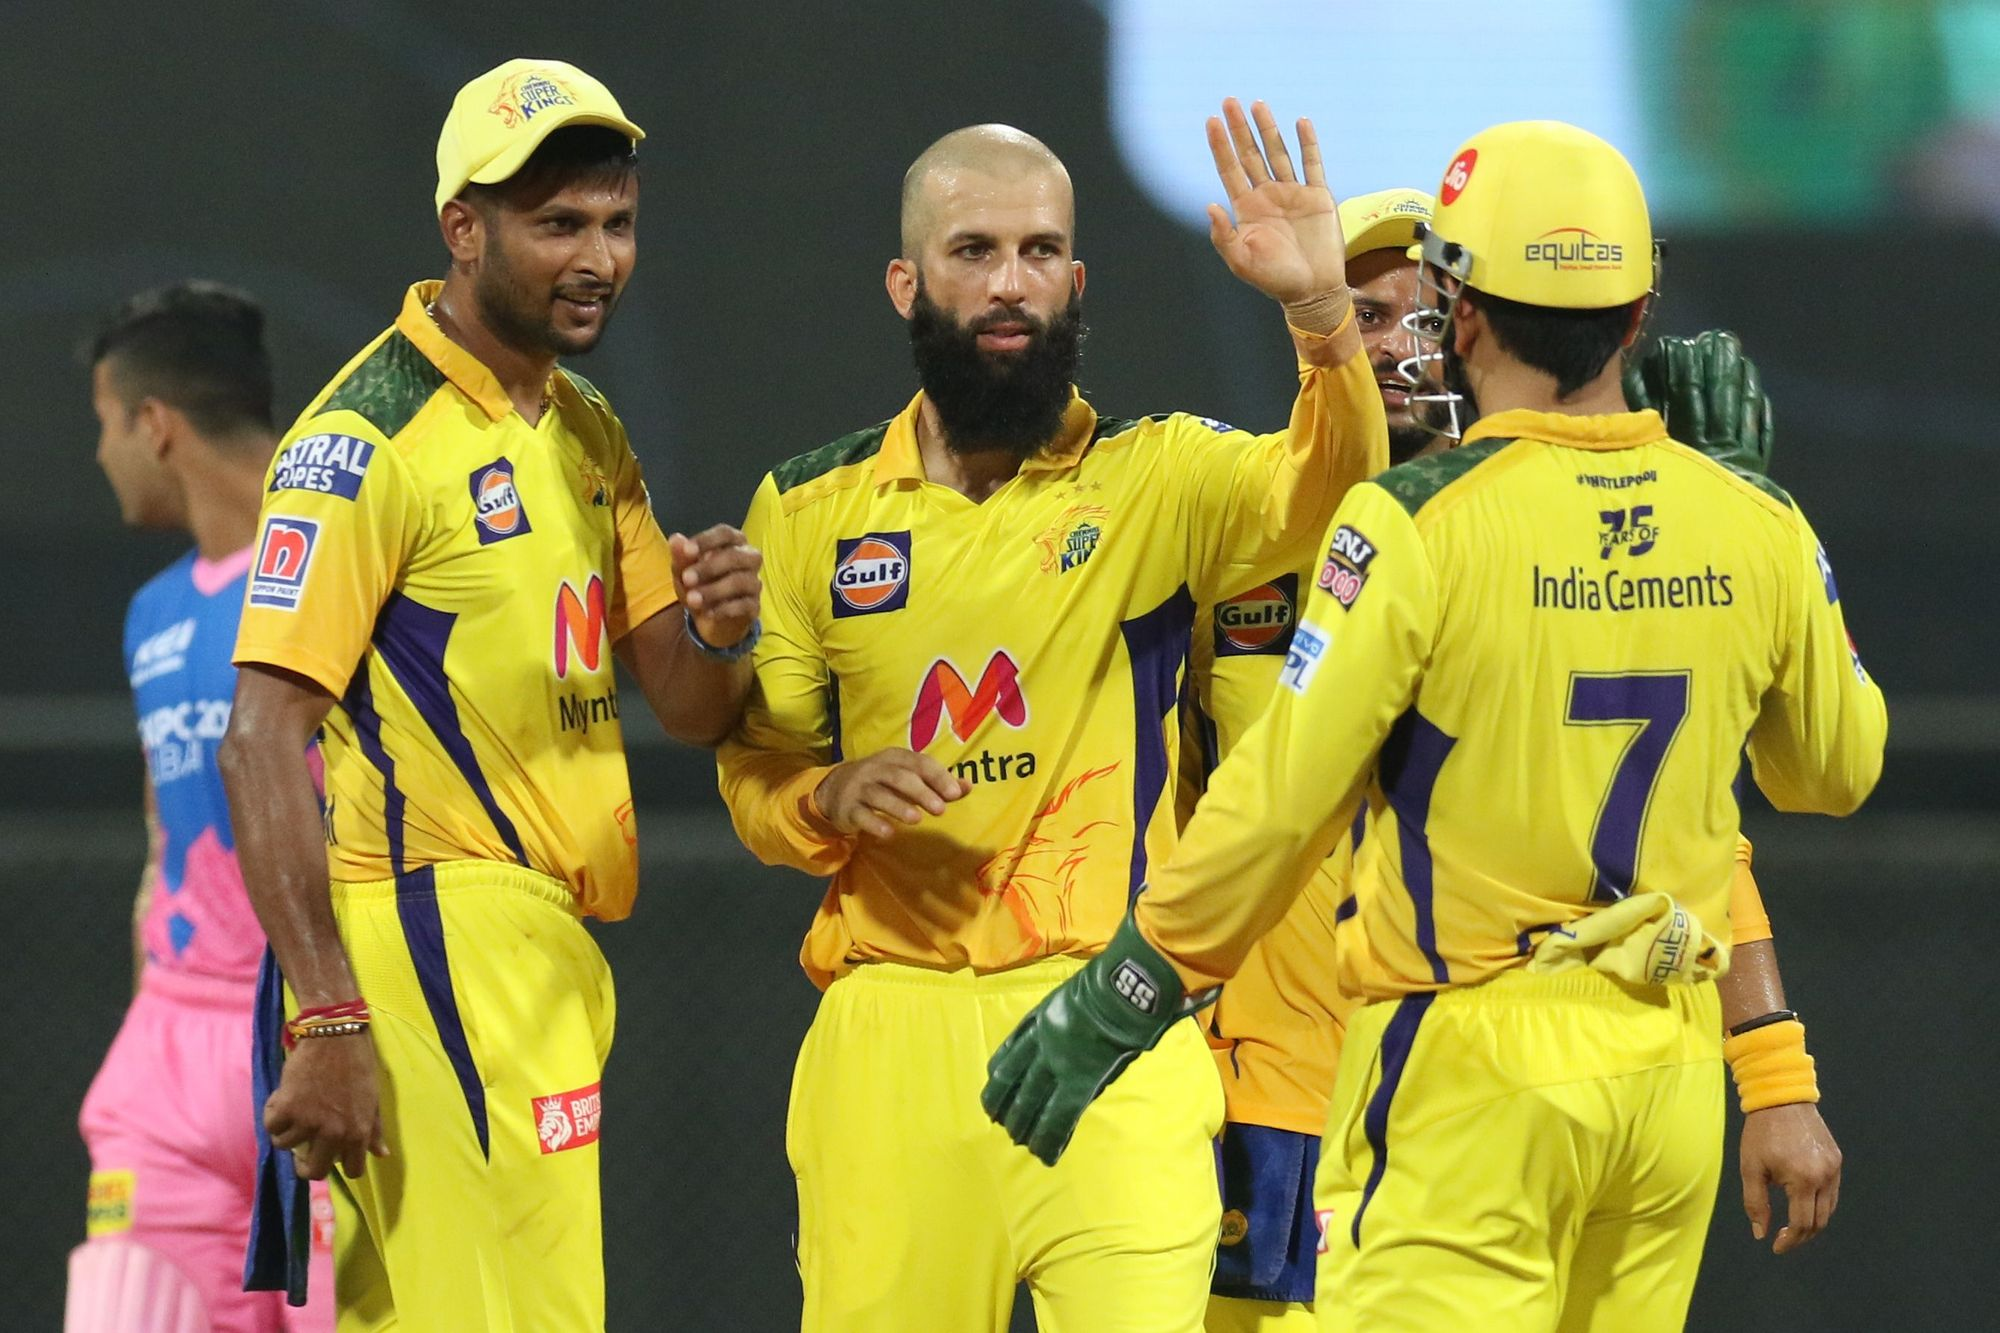 IPL 2021 : CSK vs RR : Chennai Super Kings beat Rajasthan Royals by 43 runs | Jadeja and Moeen shine